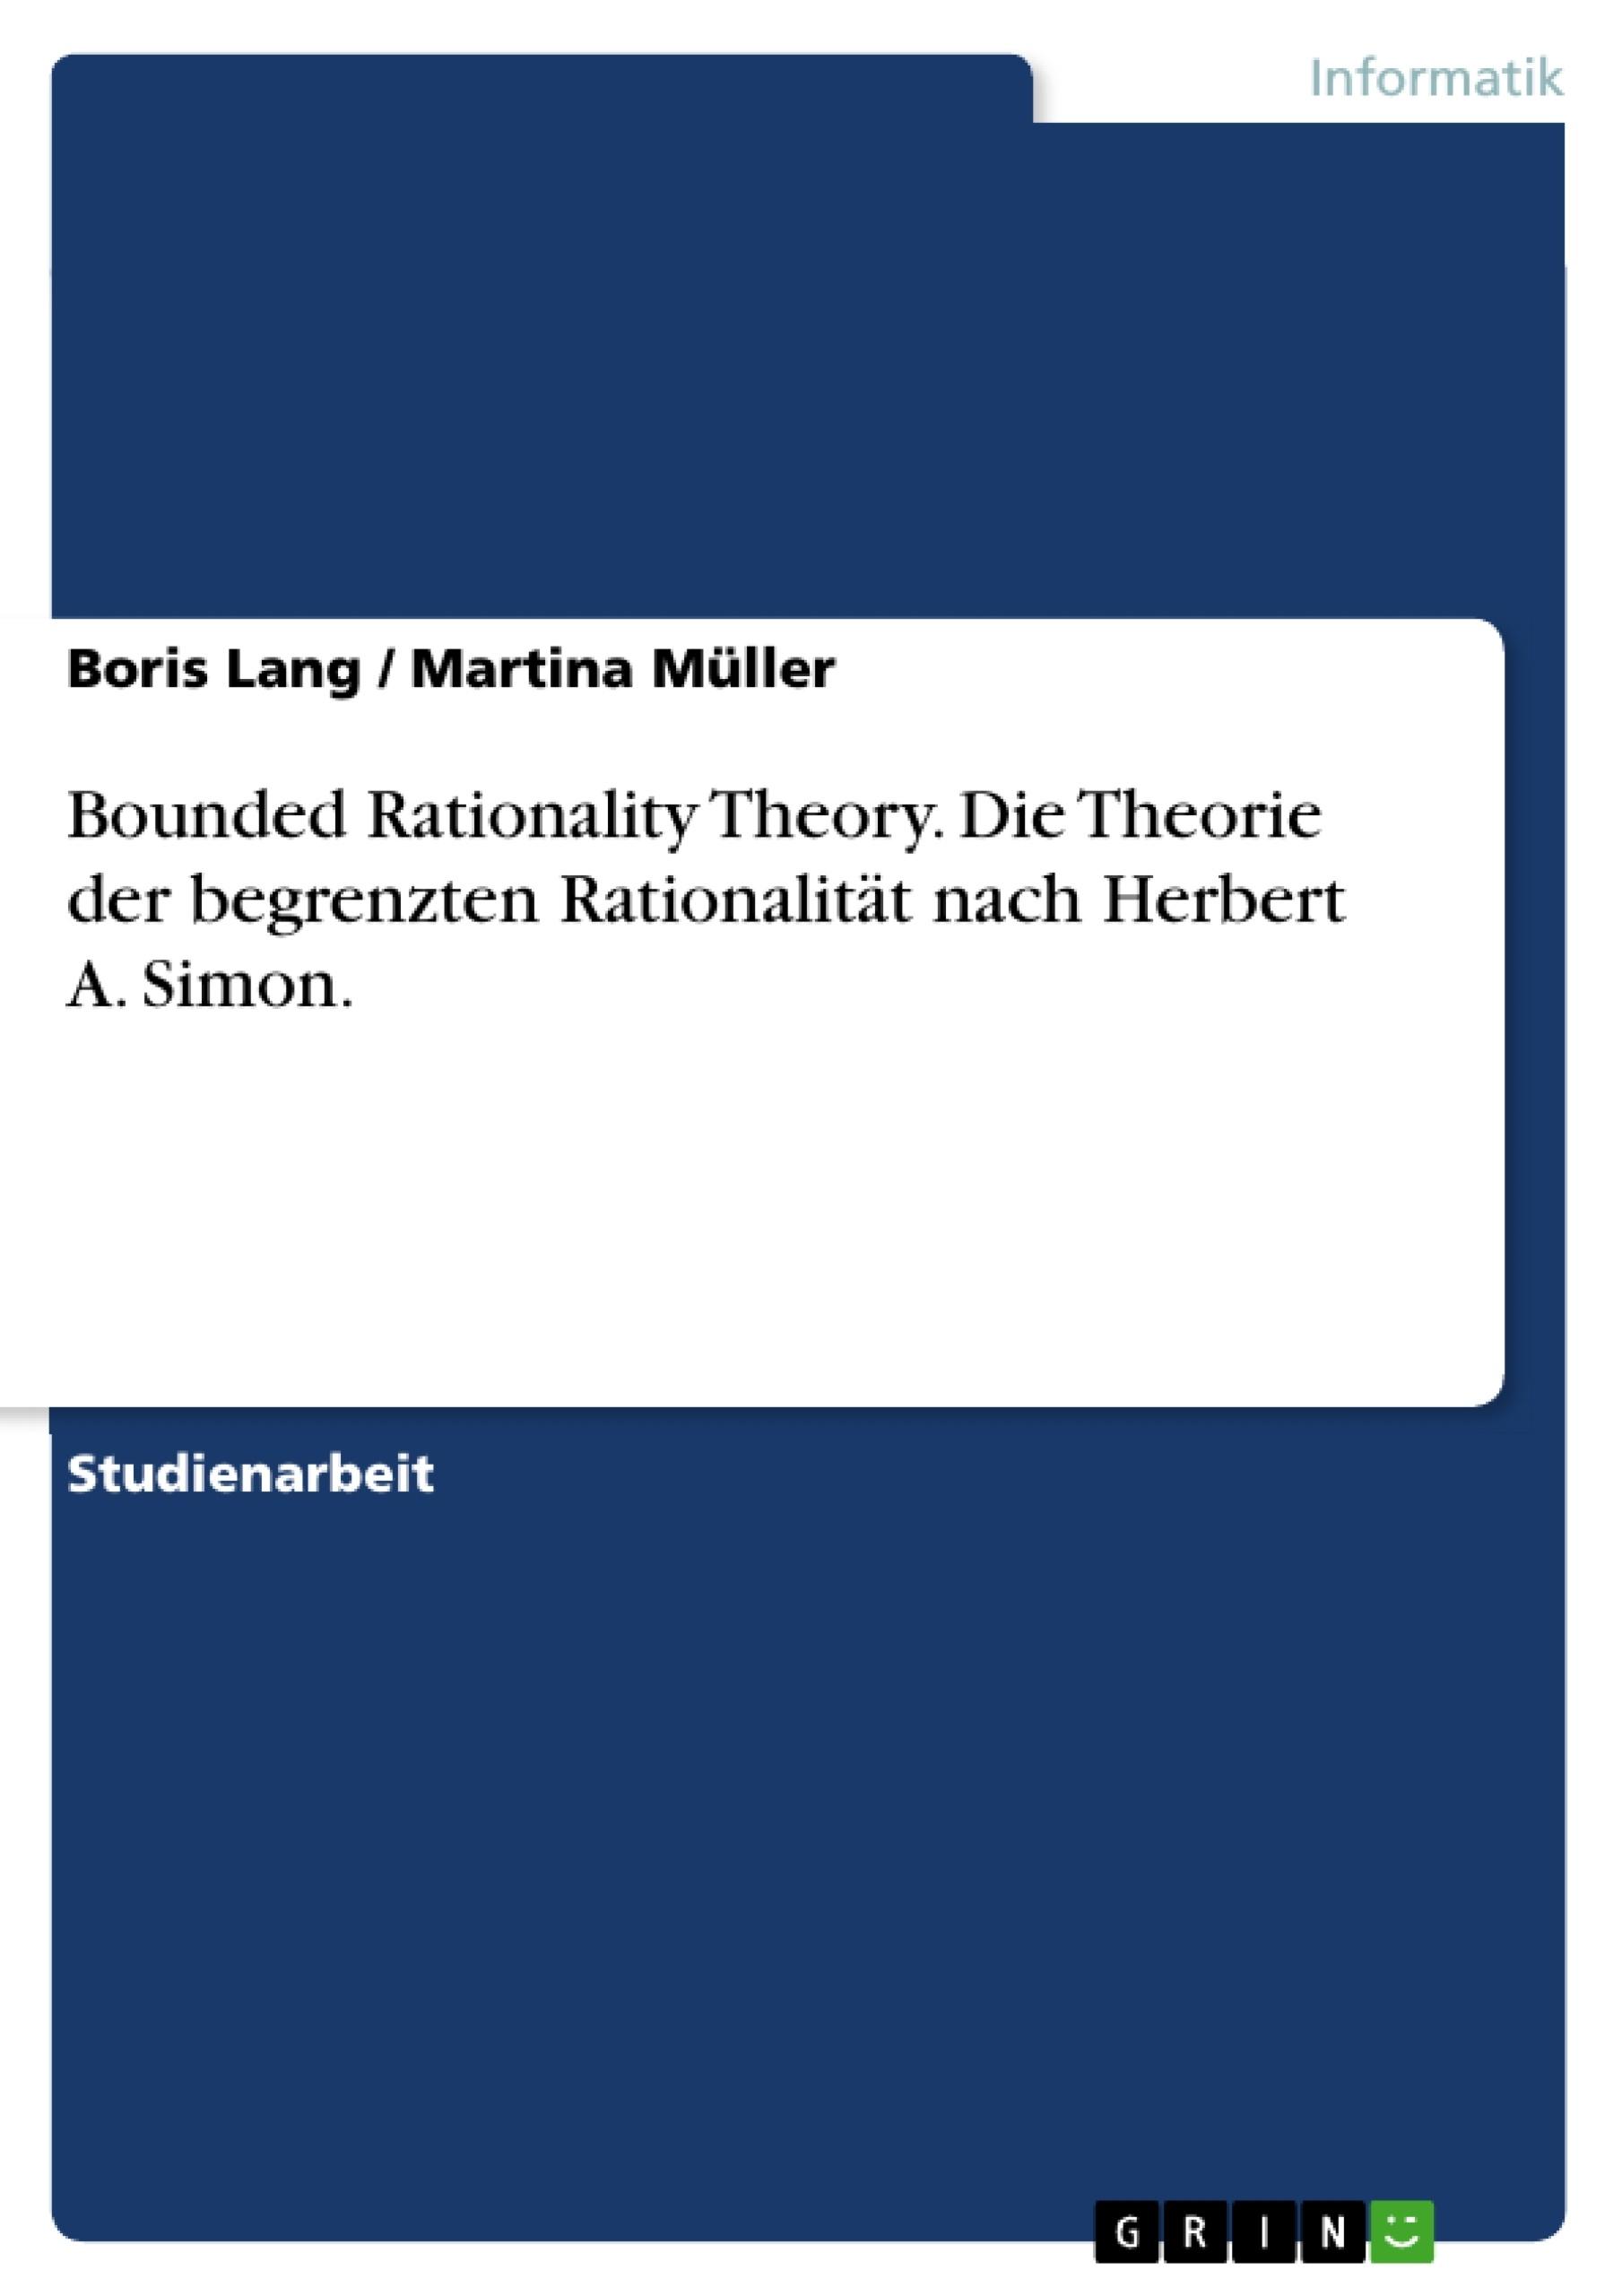 Titel: Bounded Rationality Theory. Die Theorie der begrenzten Rationalität nach Herbert A. Simon.